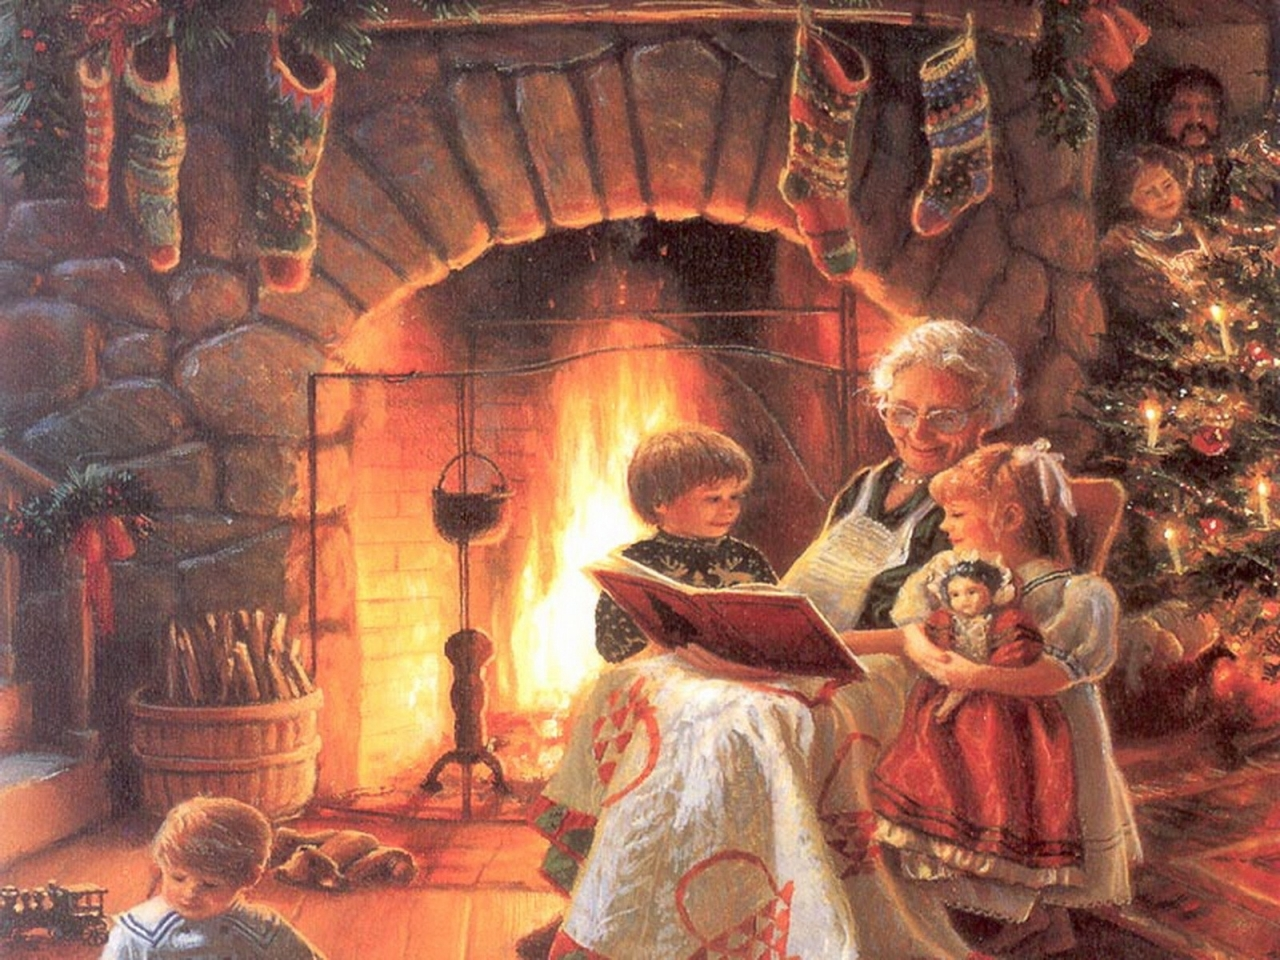 Дети слушают сказку картинки